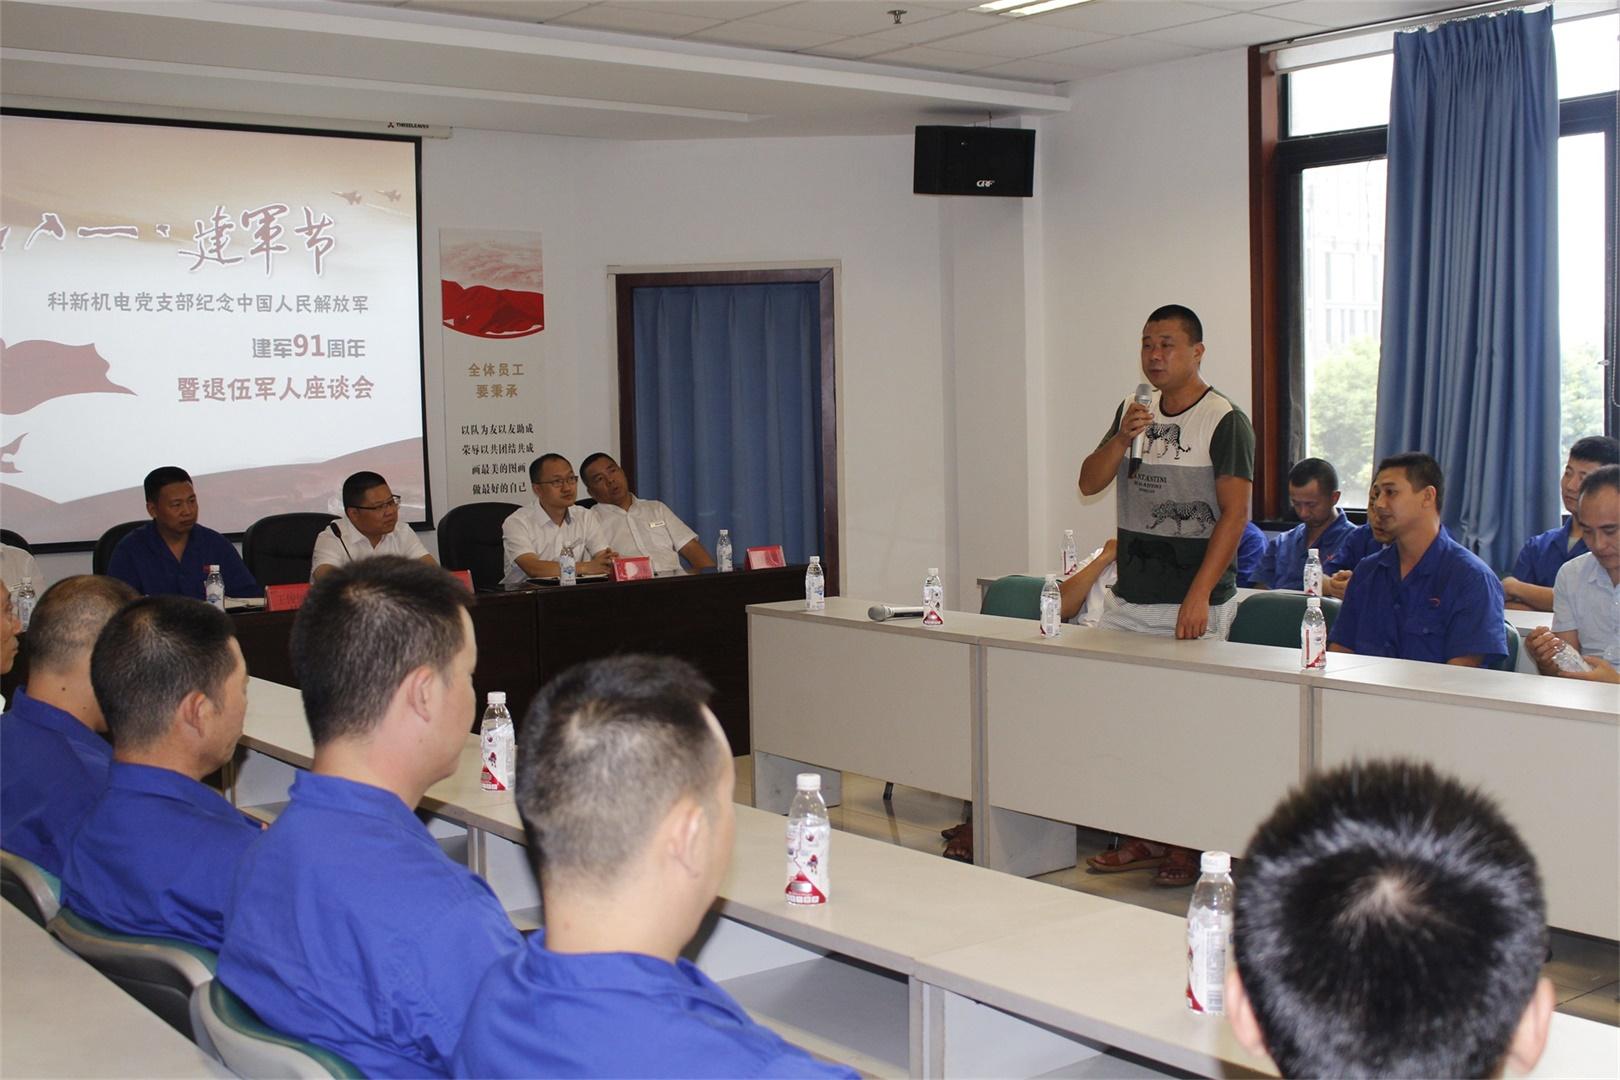 http://qiniu.cloudhong.com/image_2018-08-09_5b6bdea44bc05.jpg